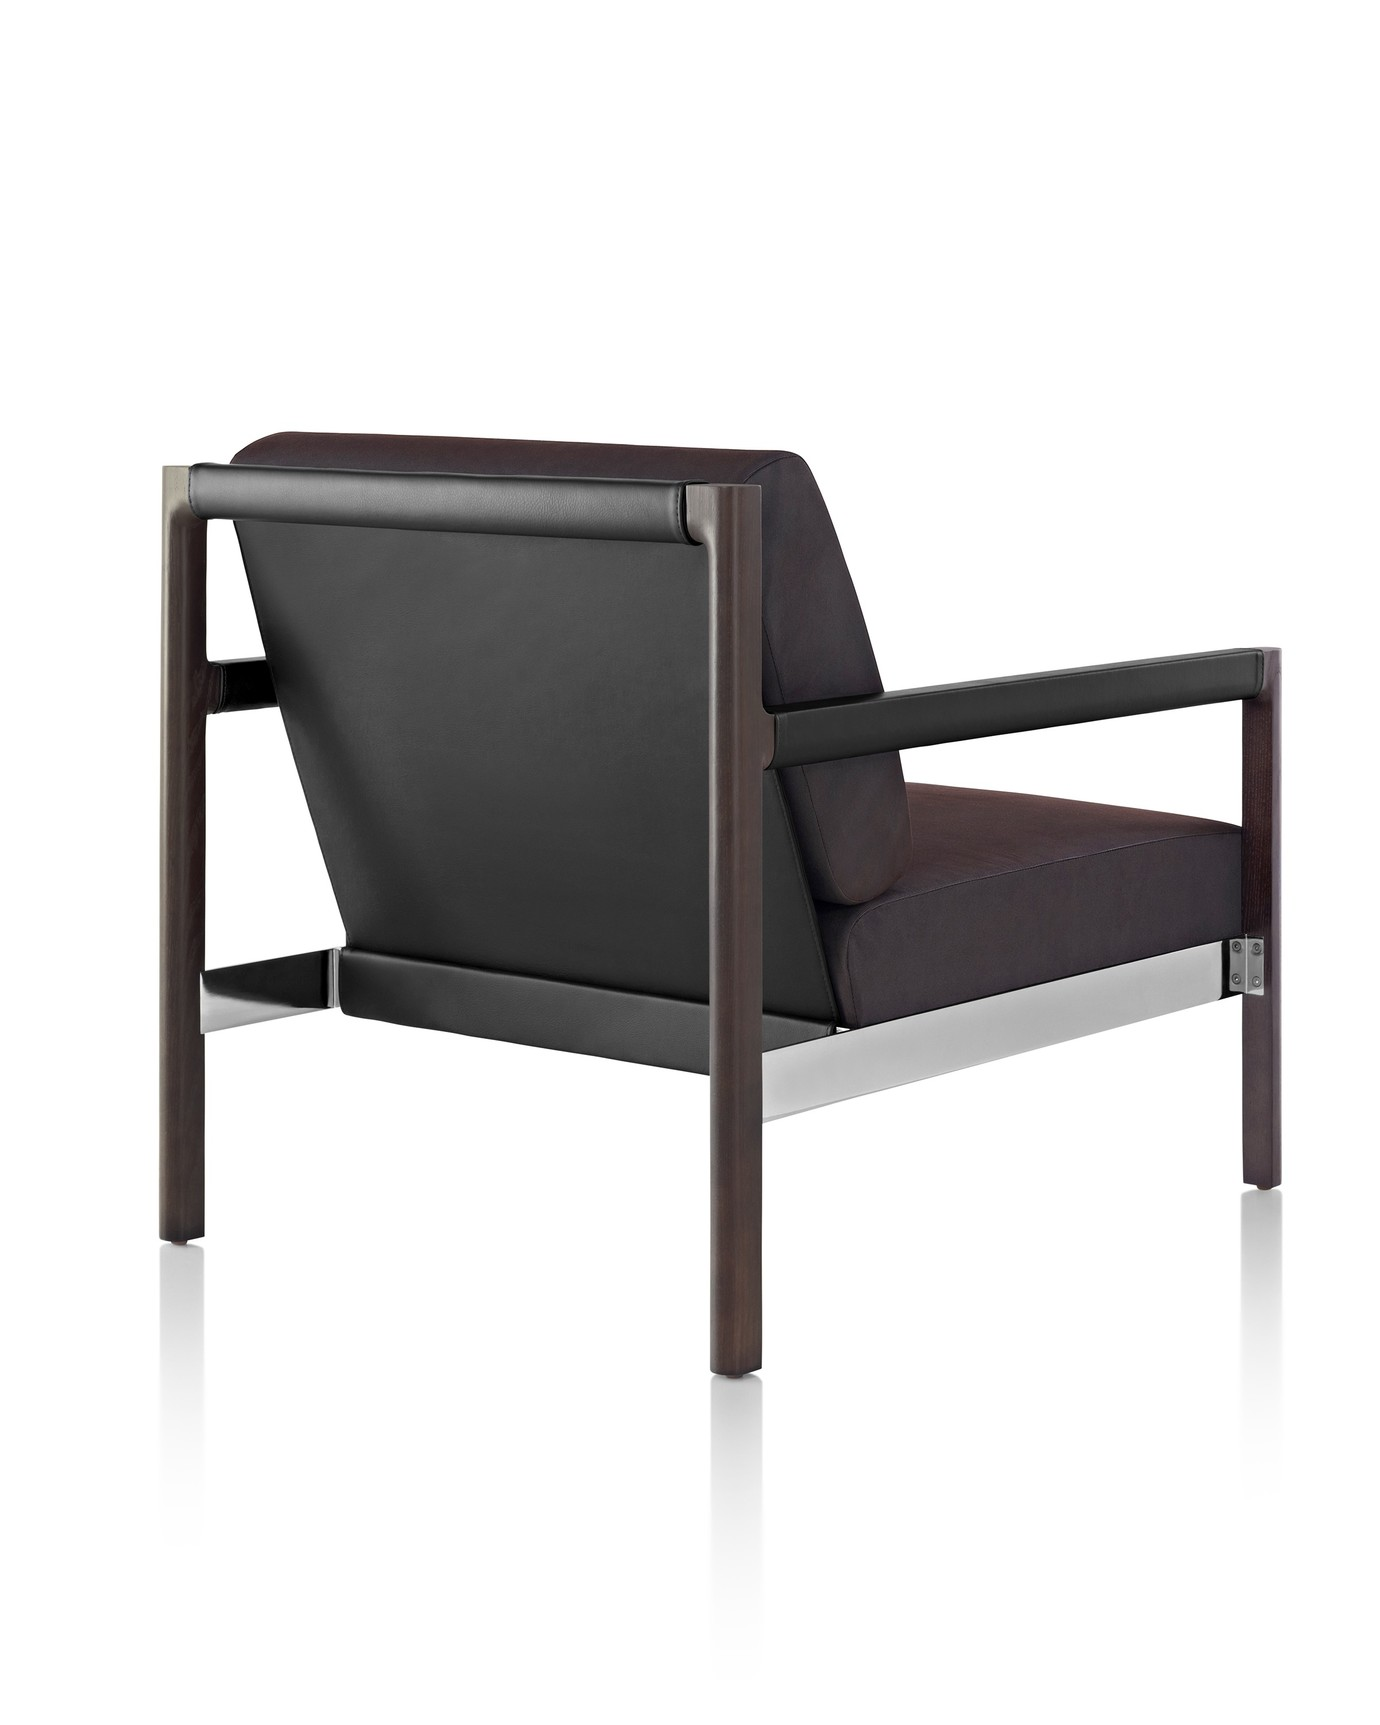 2-Silla-Lounge-Brabo-1-1380